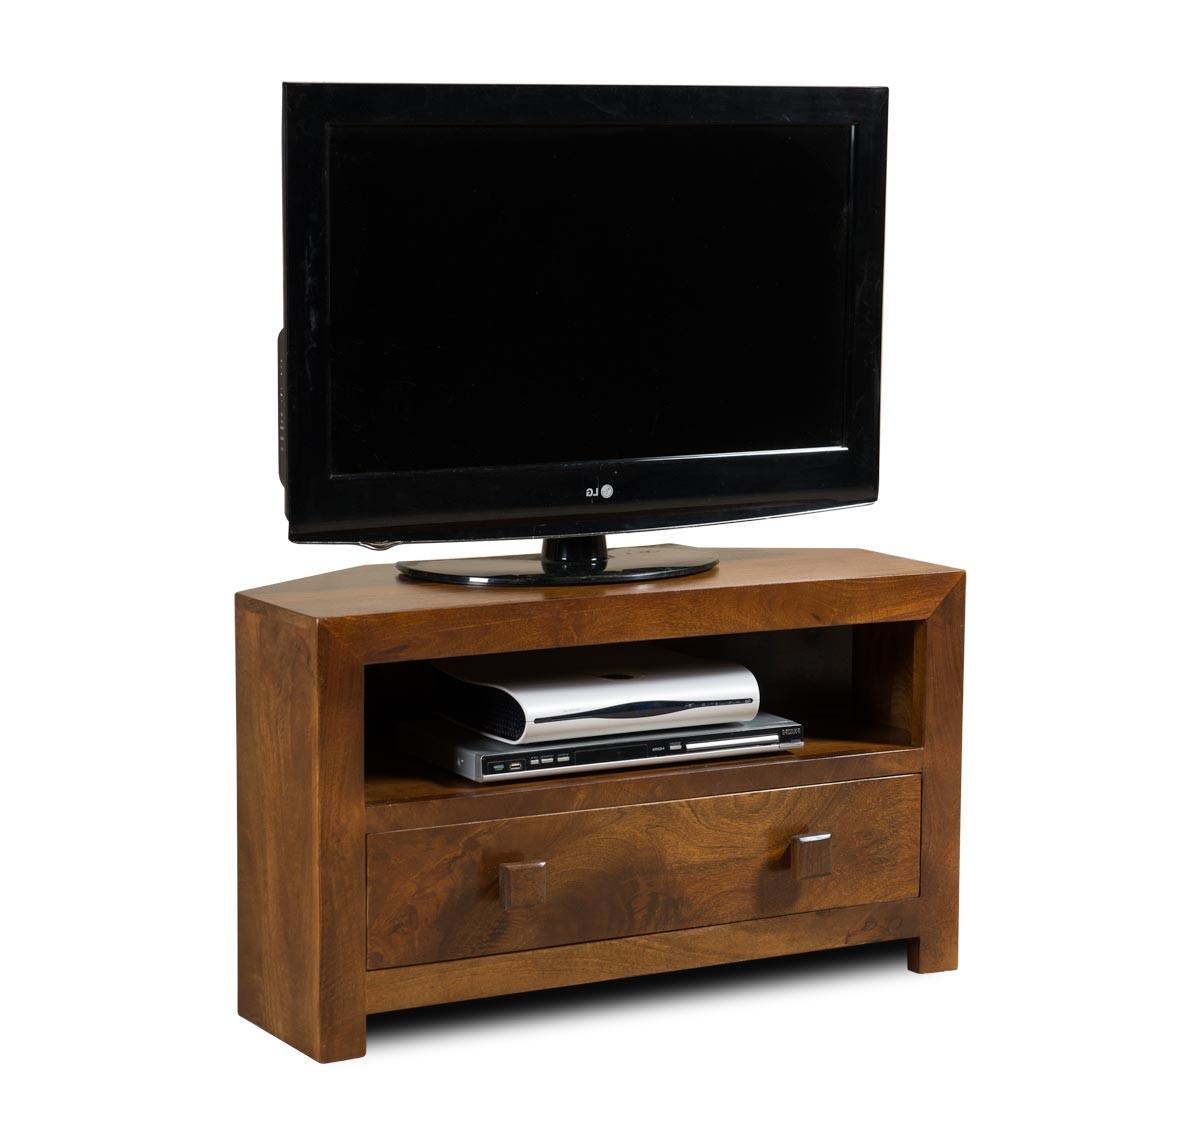 Dakota Mango Small Corner Tv Stand | Casa Bella Furniture Uk With Regard To Manhattan Compact Tv Unit Stands (View 11 of 20)